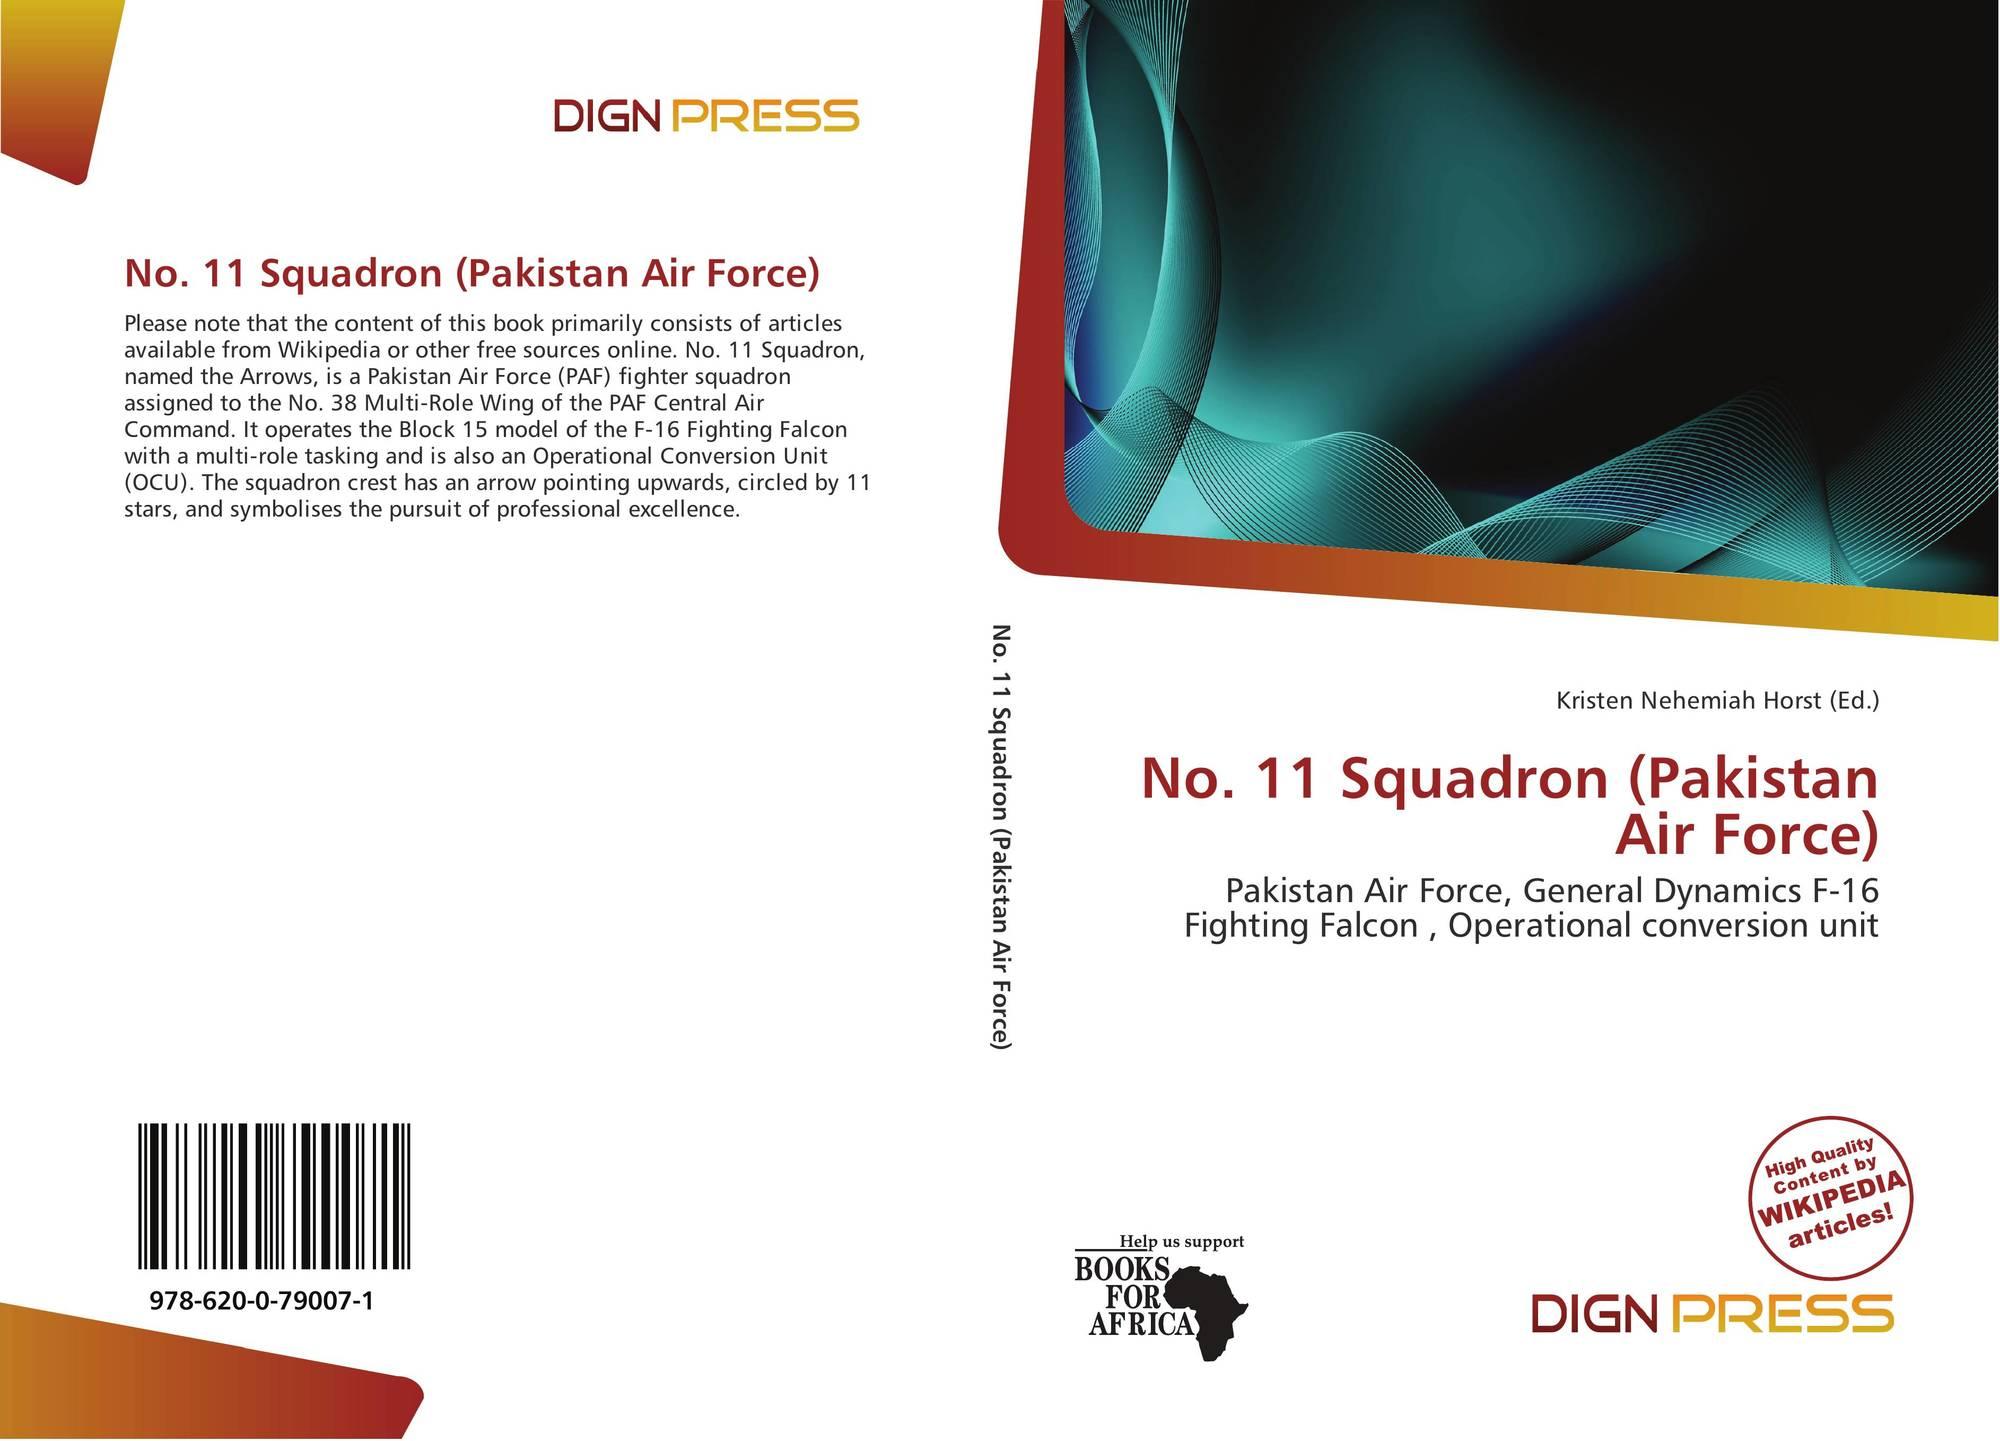 Dign No 11 Squadron Pakistan Air Force 978 620 0 79007 1